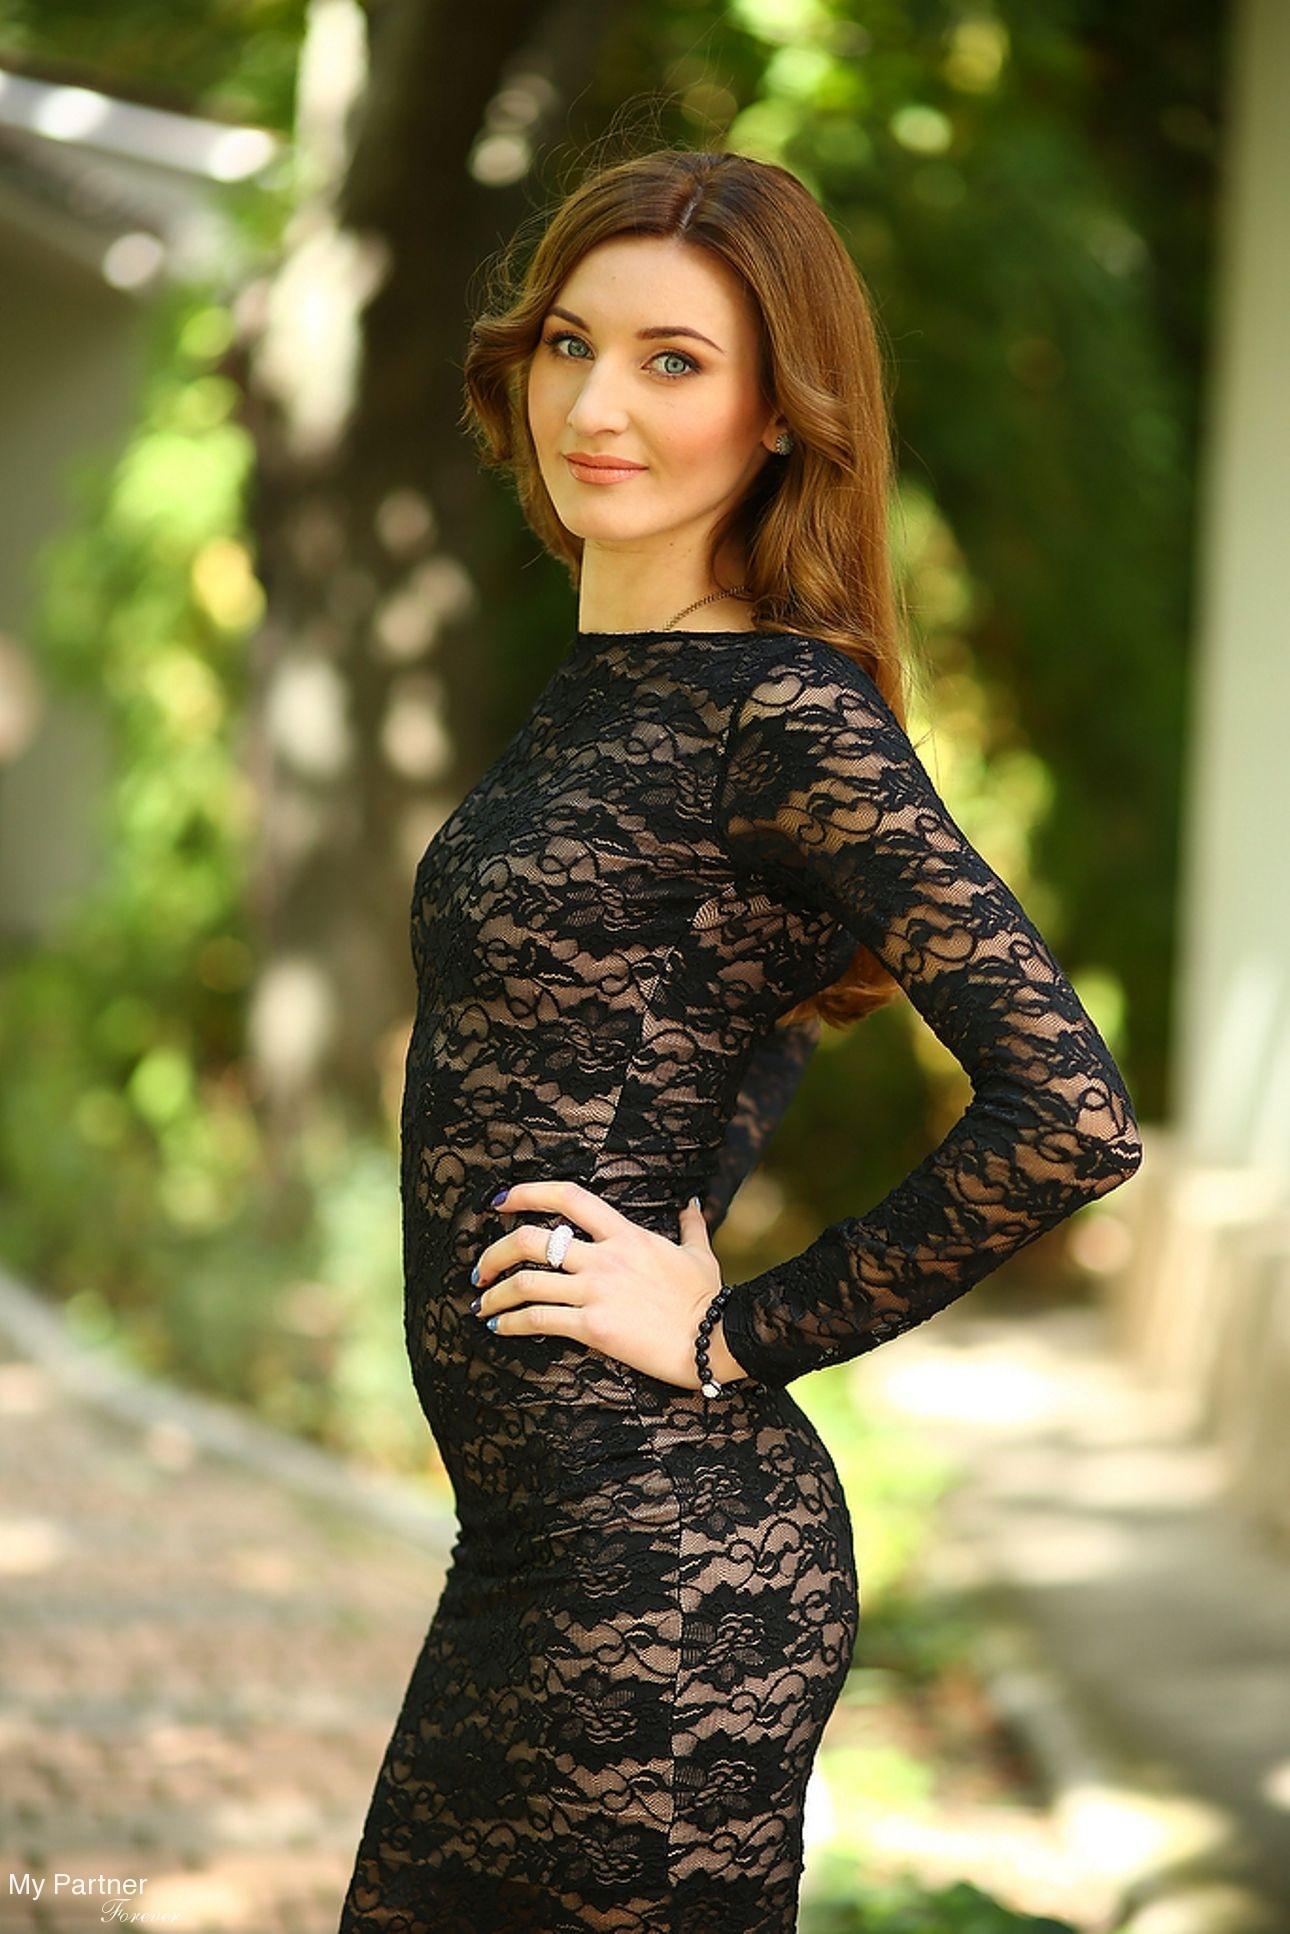 Single Women from Zaporozhye, Girls Date For Free Zaporozhye